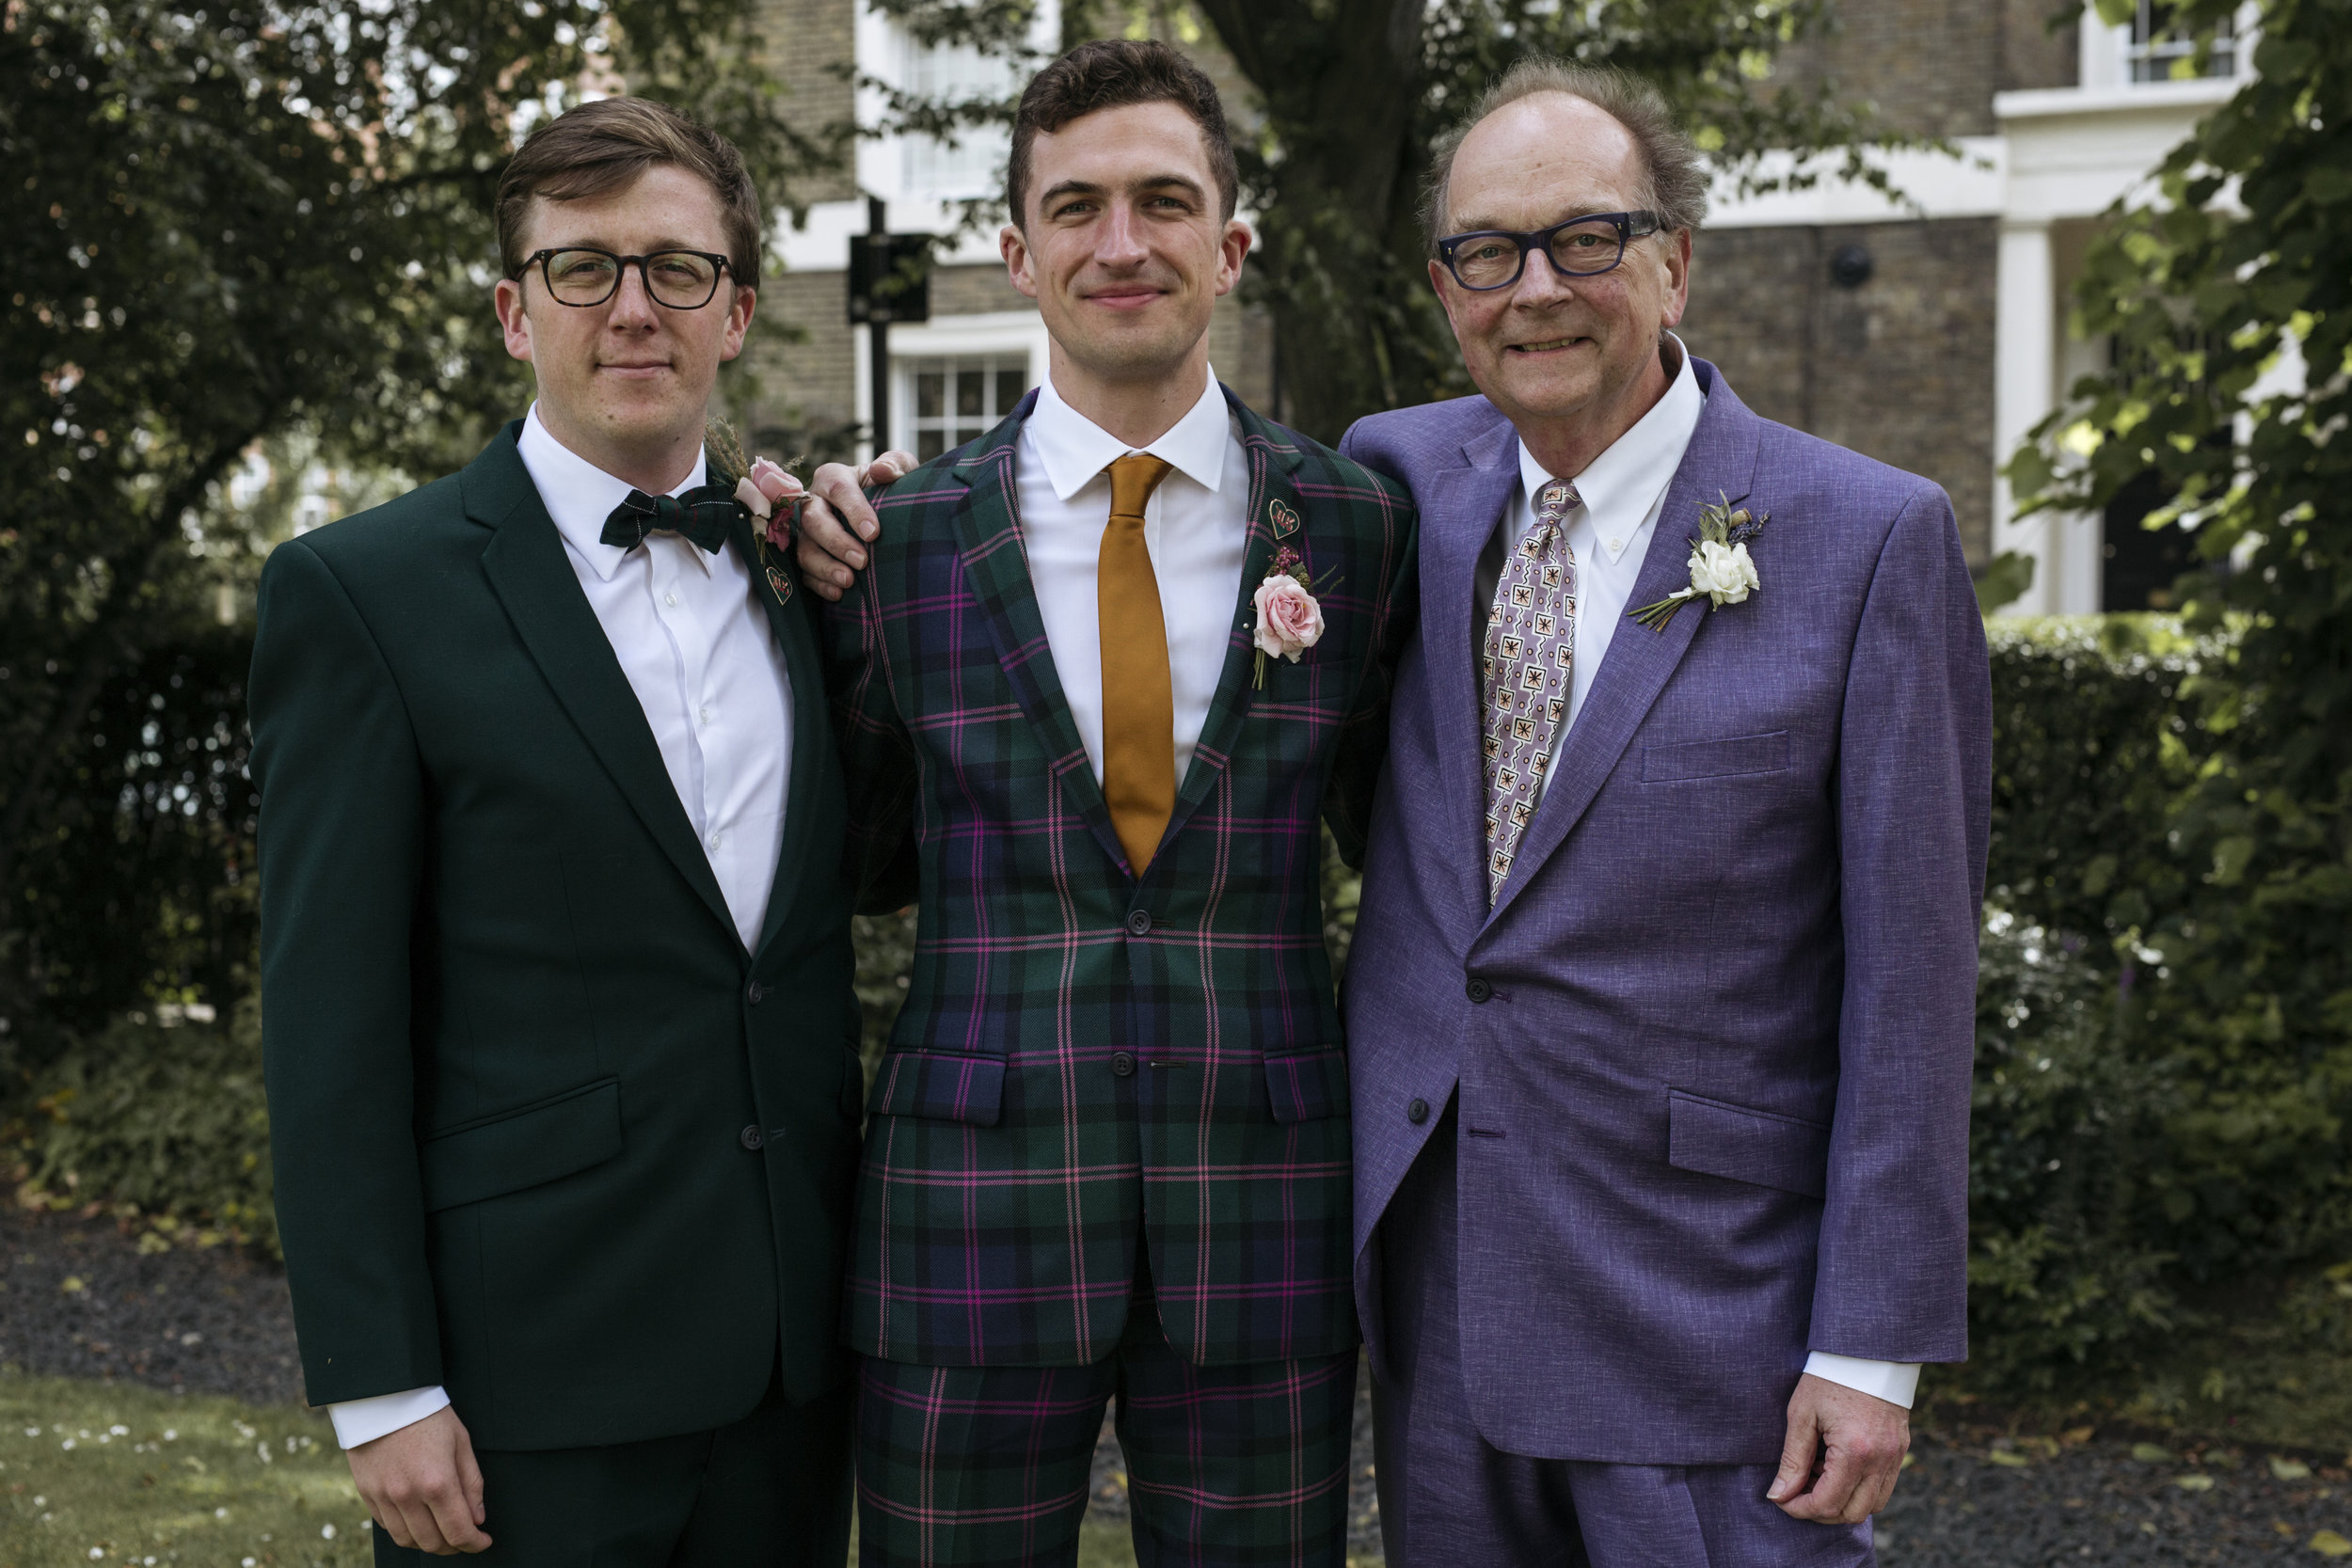 bespoke-tartan-suit-dugdale-purple-dormeuil-susannah-hall-tailor-made-uk-wedding-stylish.jpg